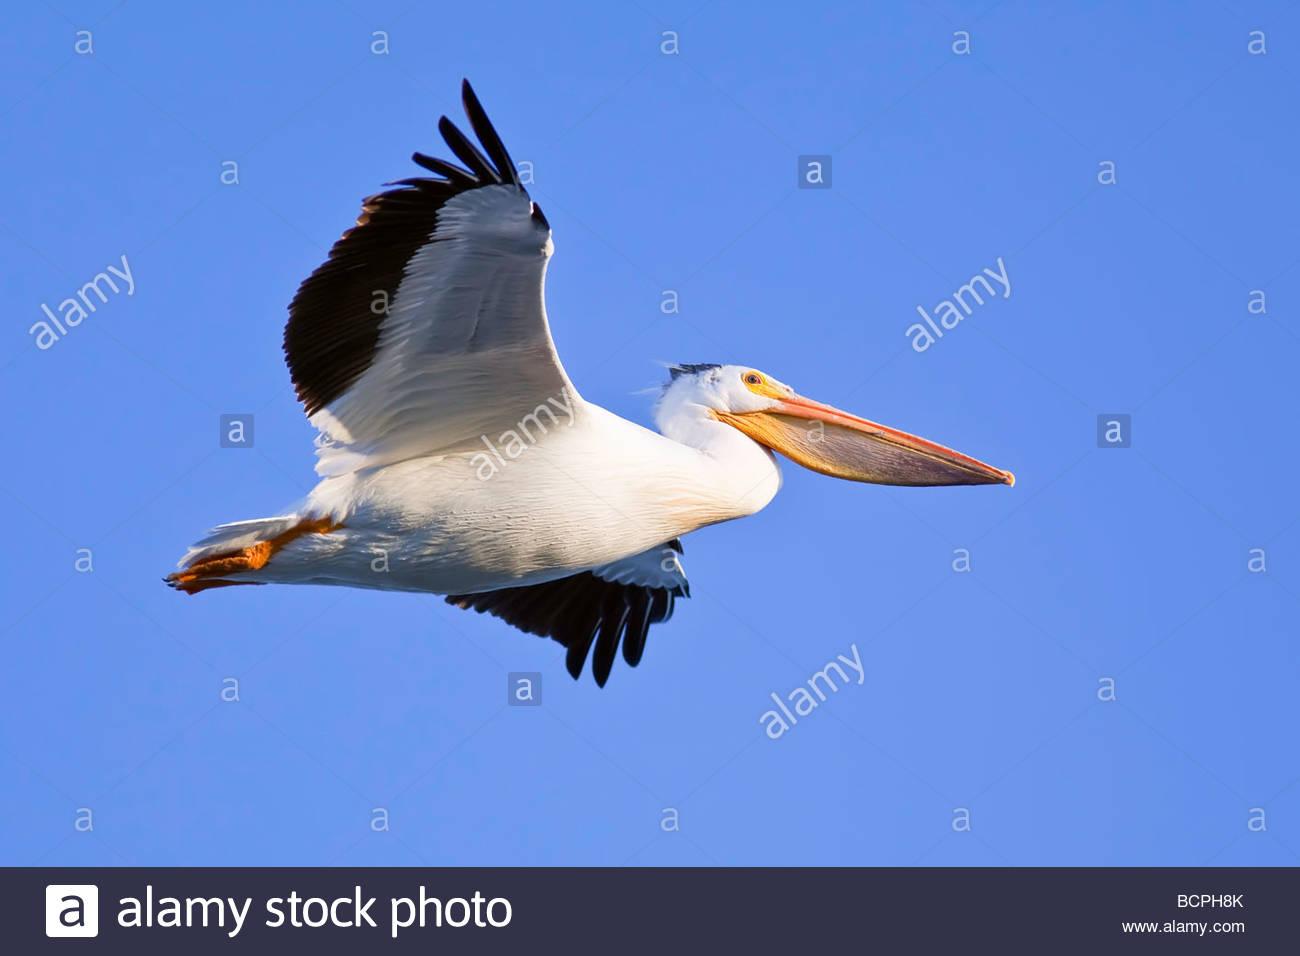 American White Pelican in flight - Stock Image